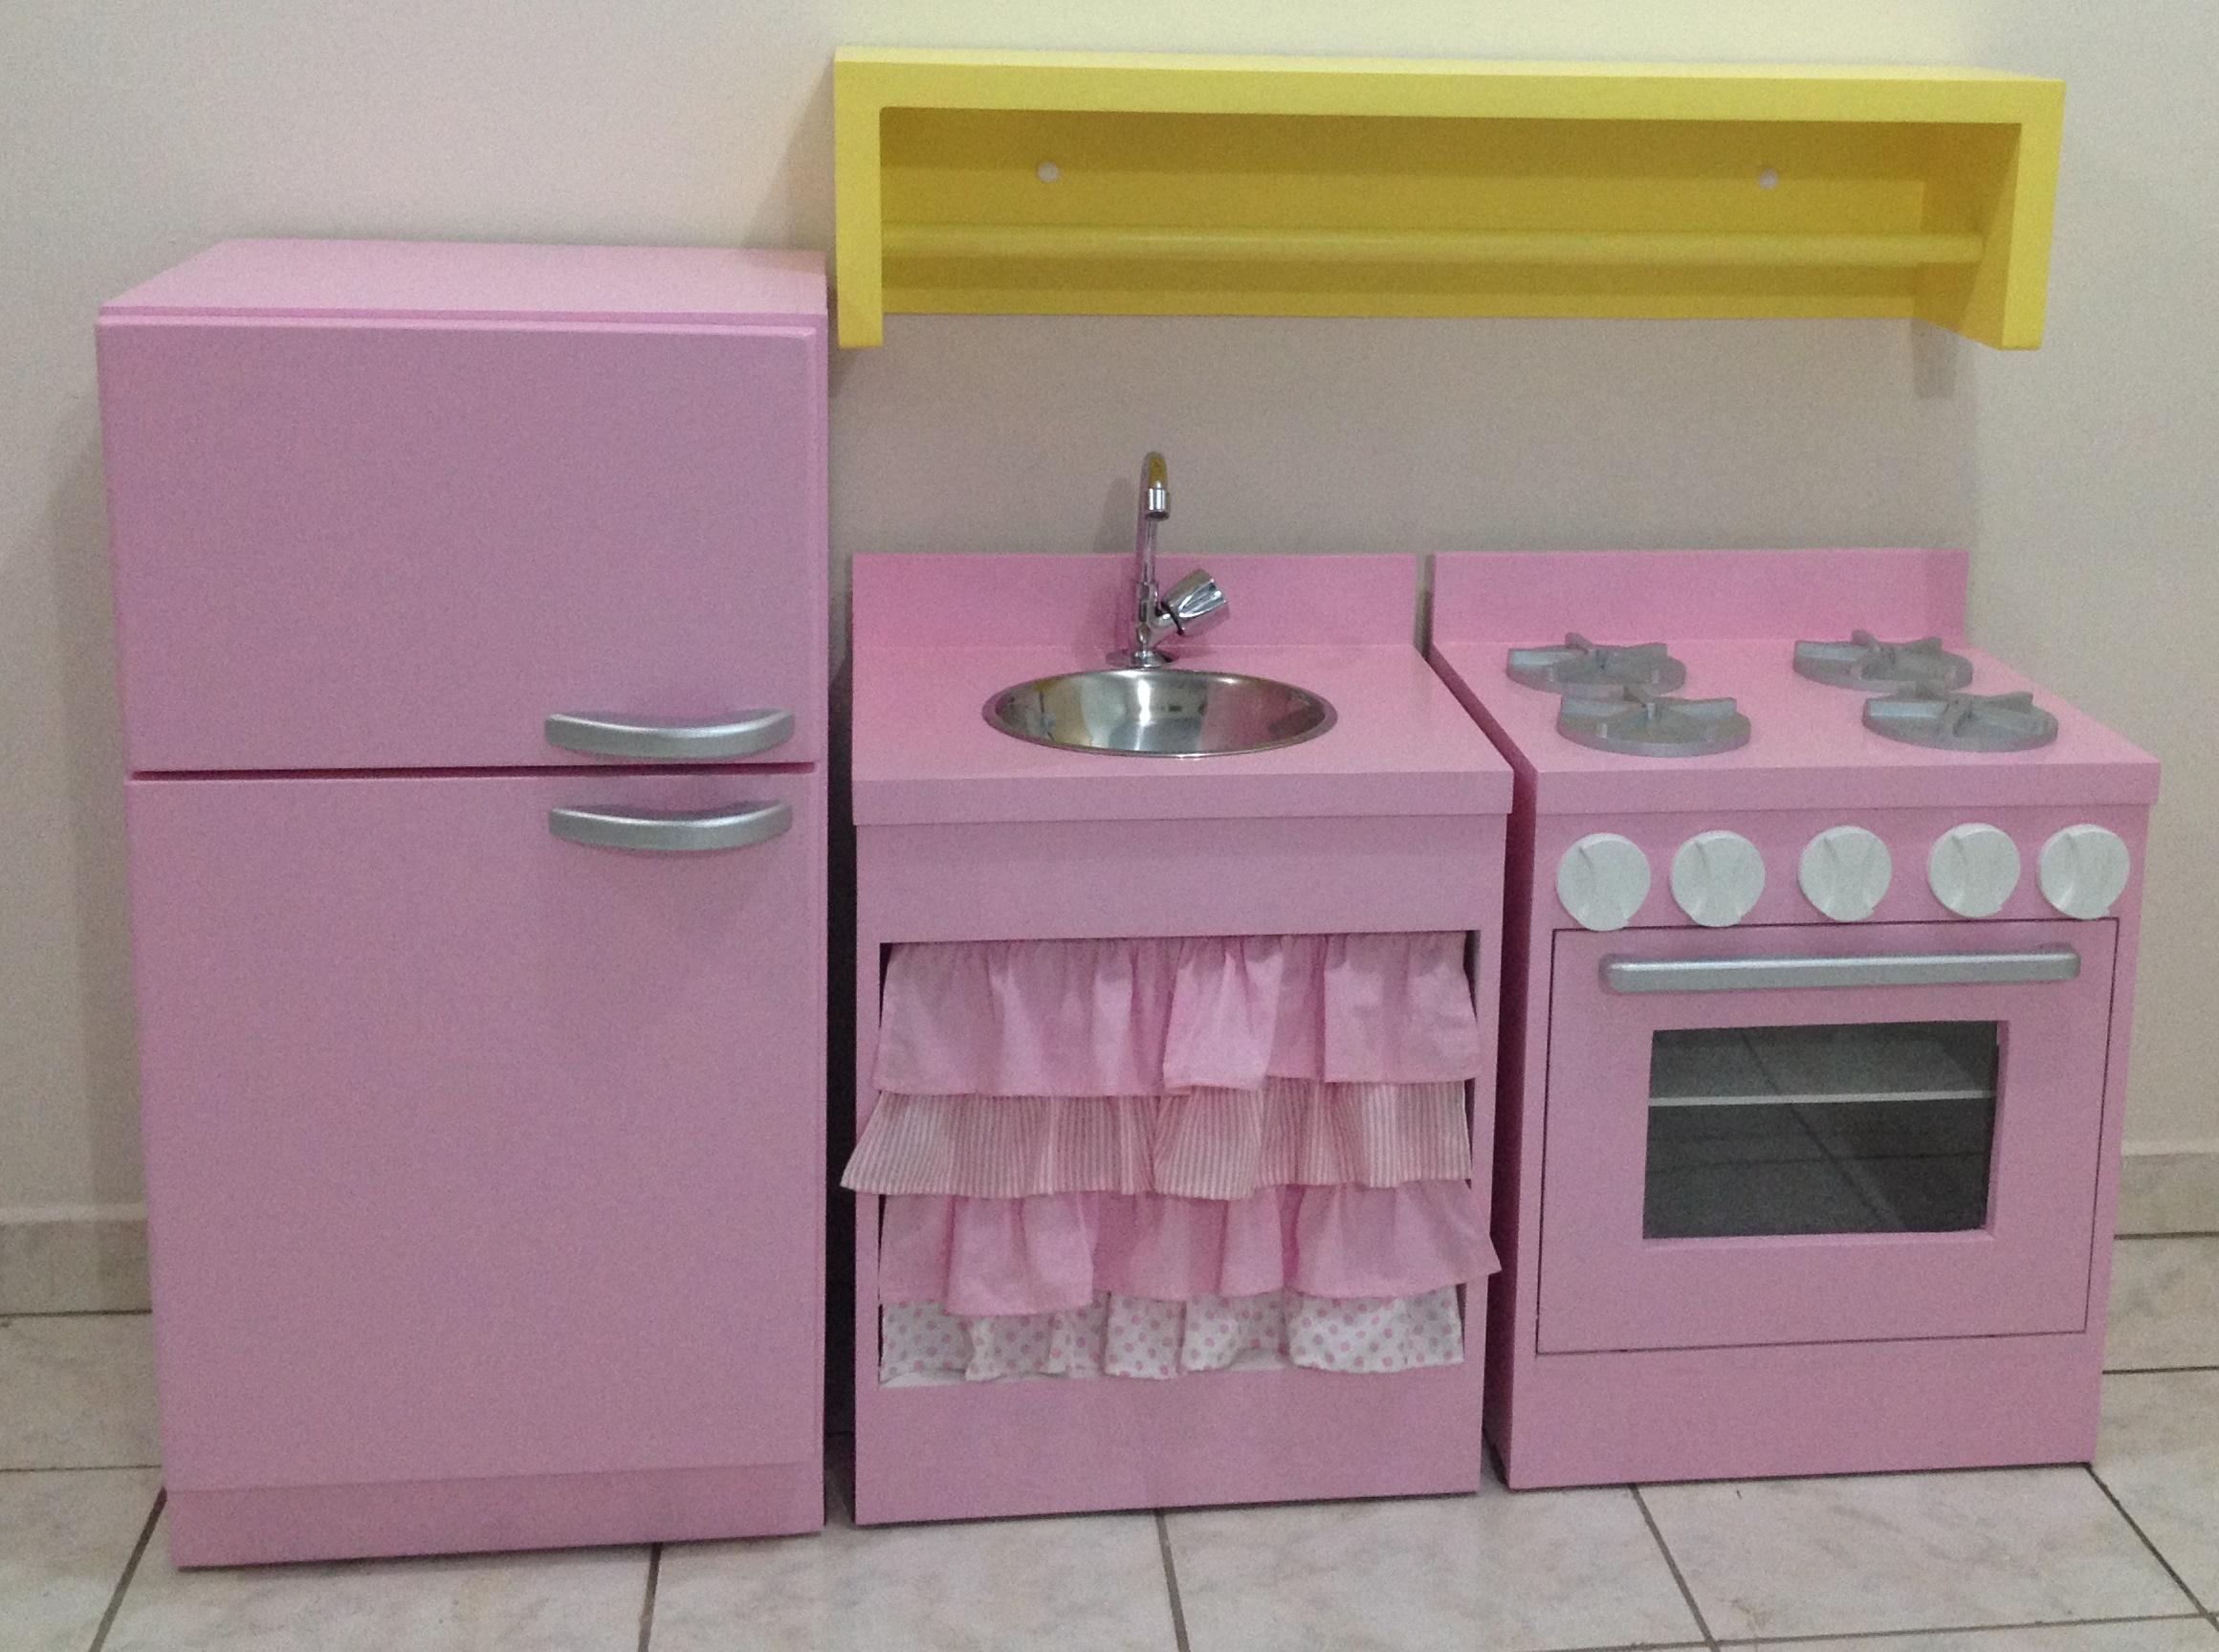 Cozinha Infantil Lyra G Ateliê Nelma Almeida Elo7 #9B842F 2320x1727